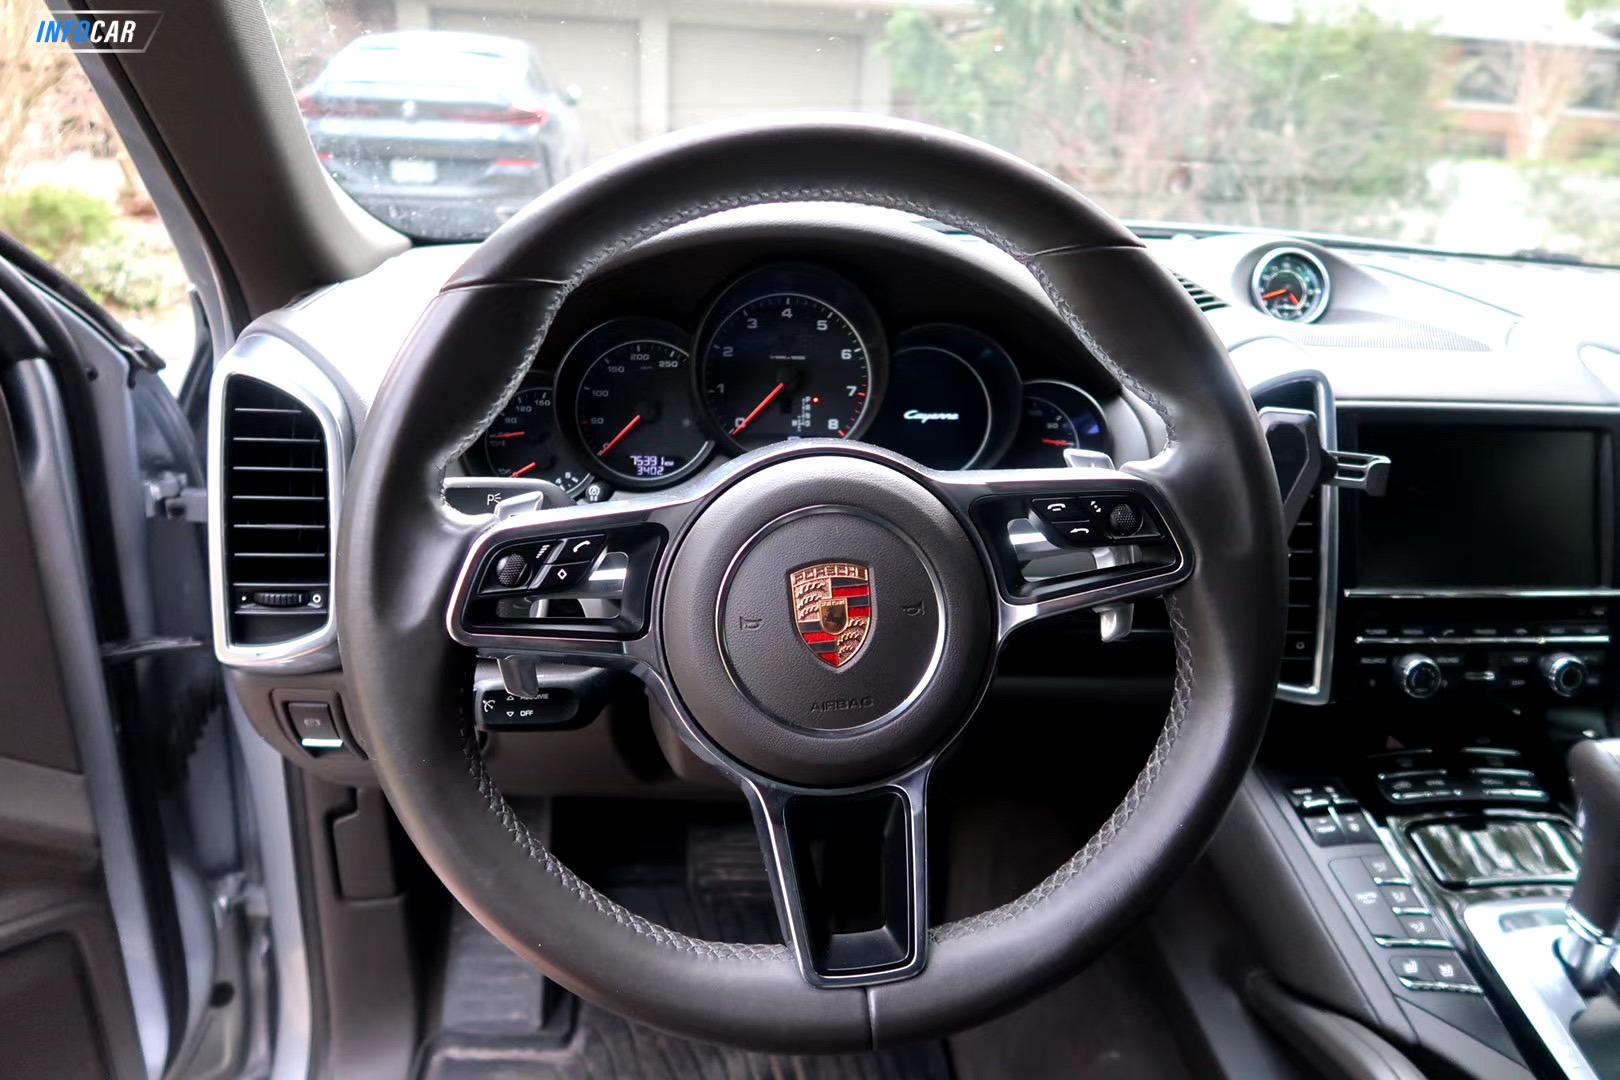 2016 Porsche Cayenne  - INFOCAR - Toronto's Most Comprehensive New and Used Auto Trading Platform